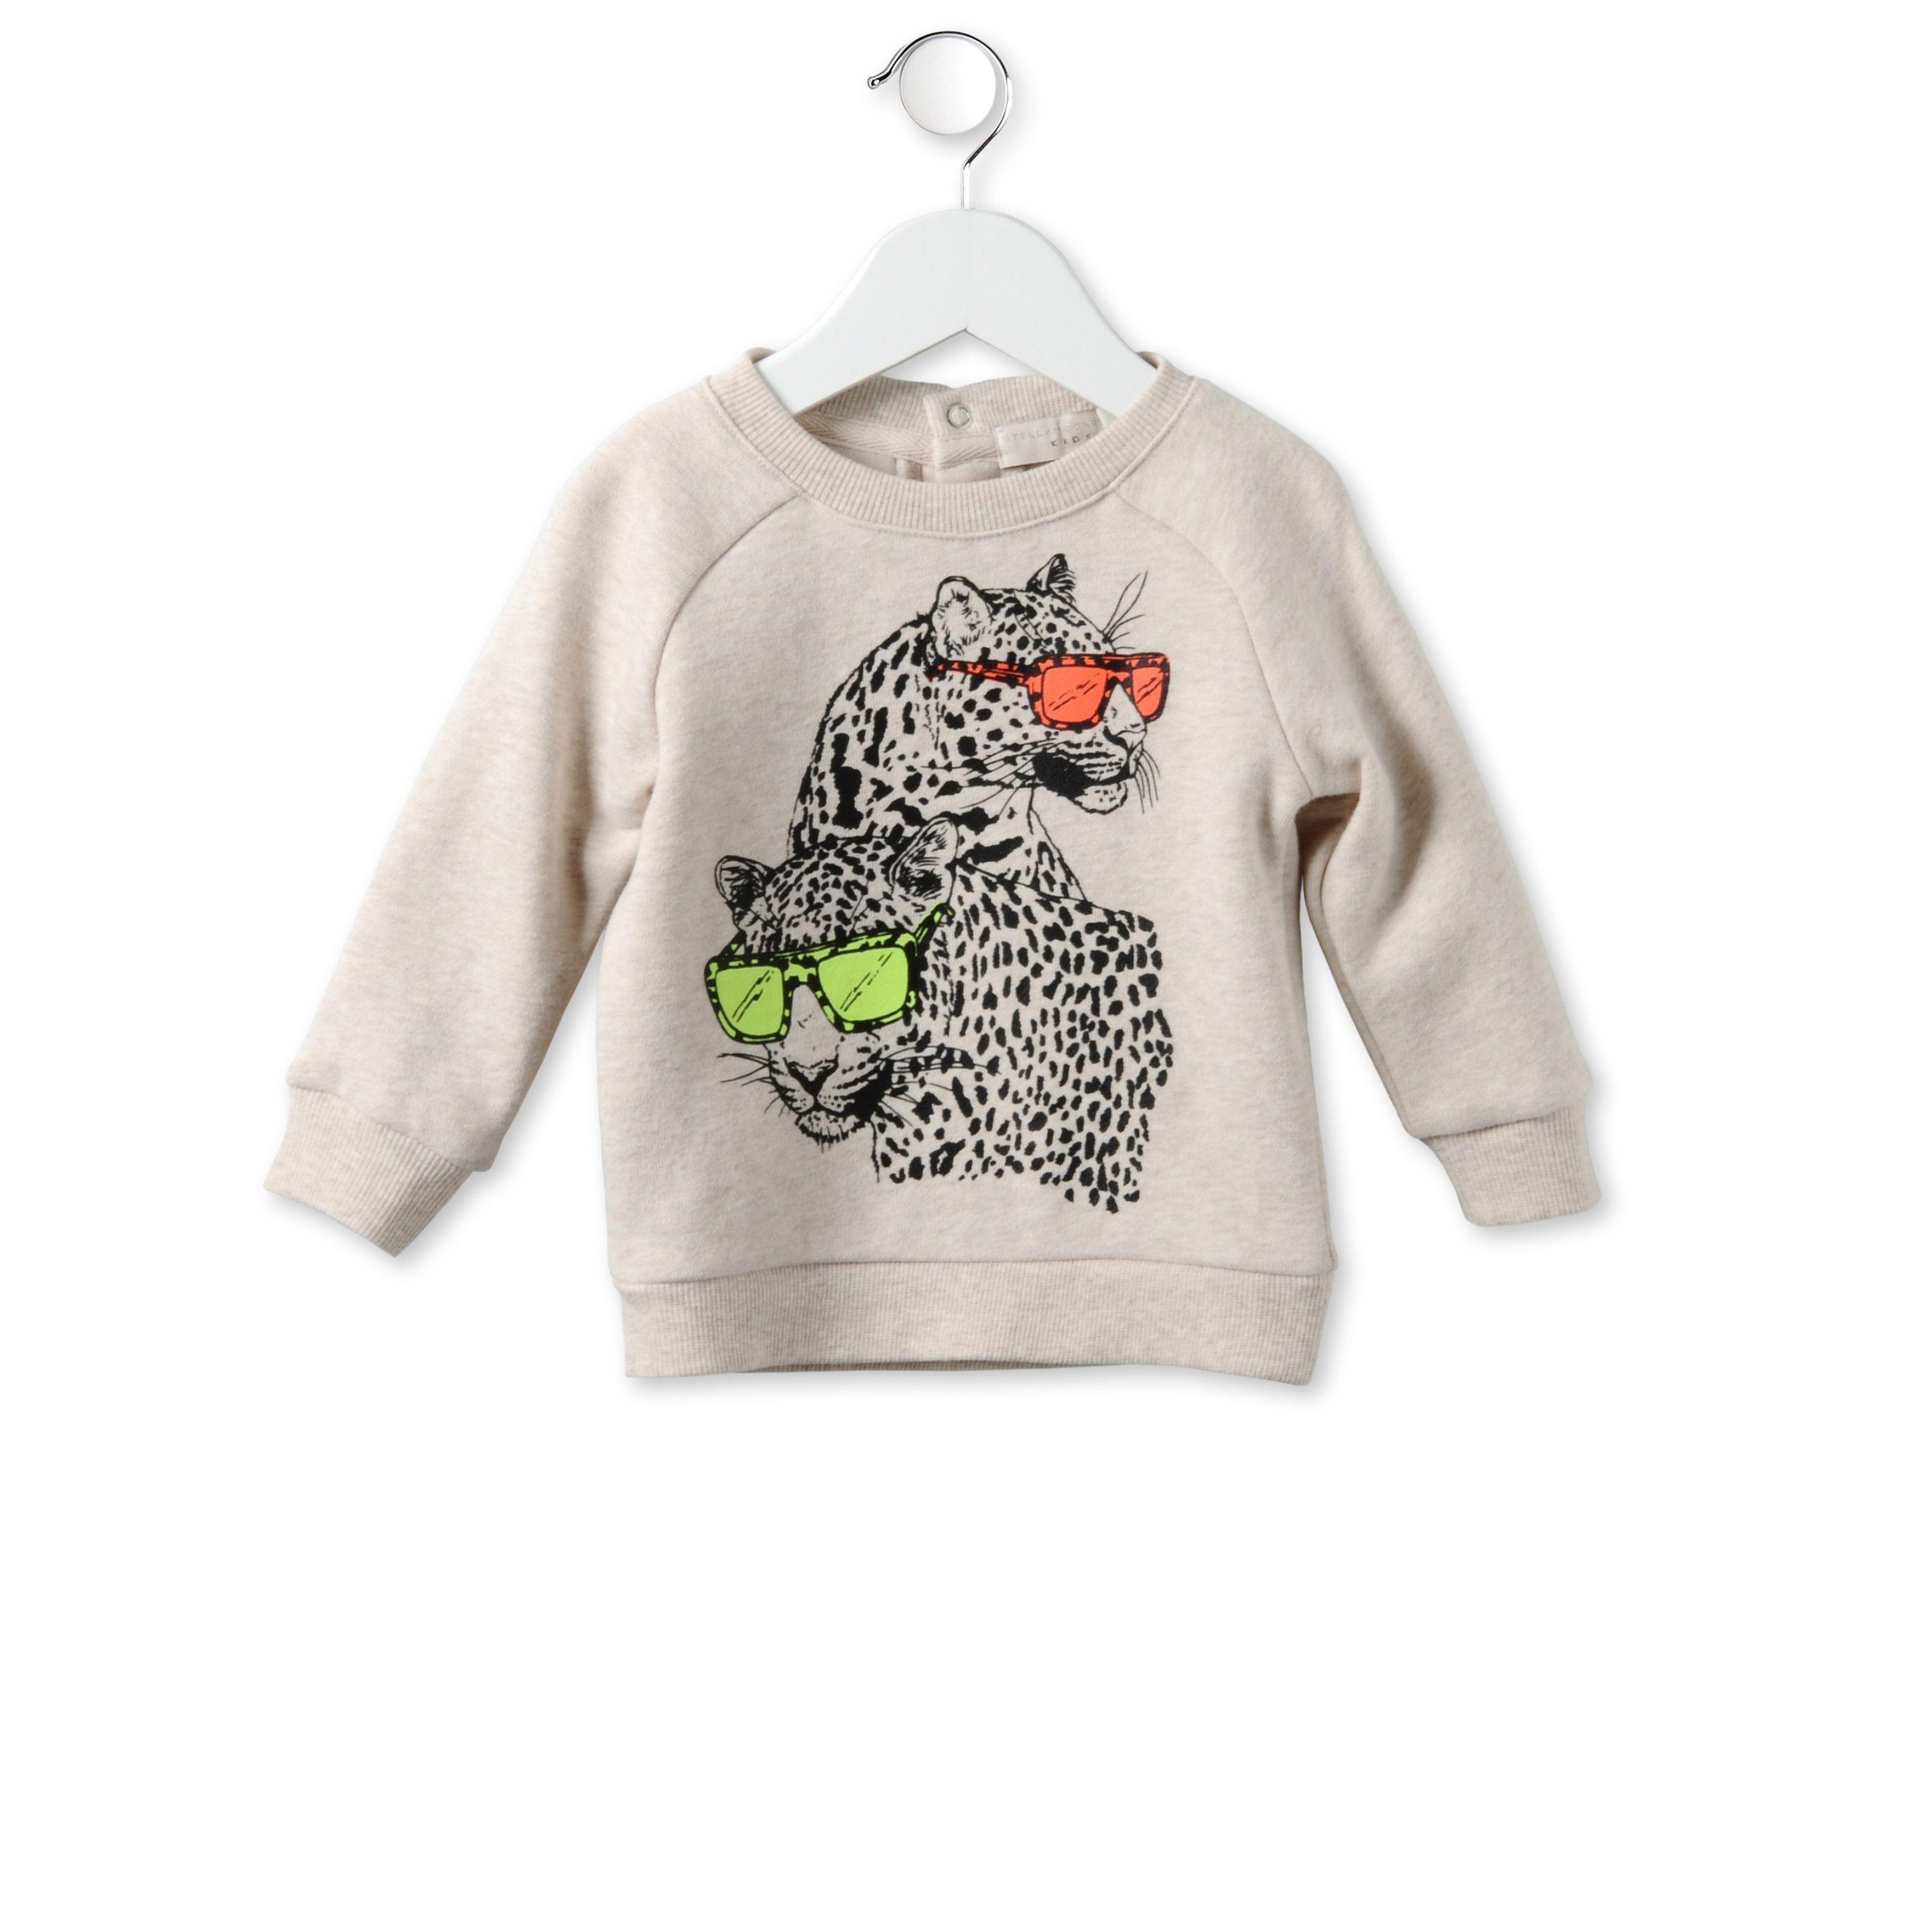 806079510b75f Sweat Shirt Billy Crème Avec Imprimé Léopard - Stella Mccartney Kids ...